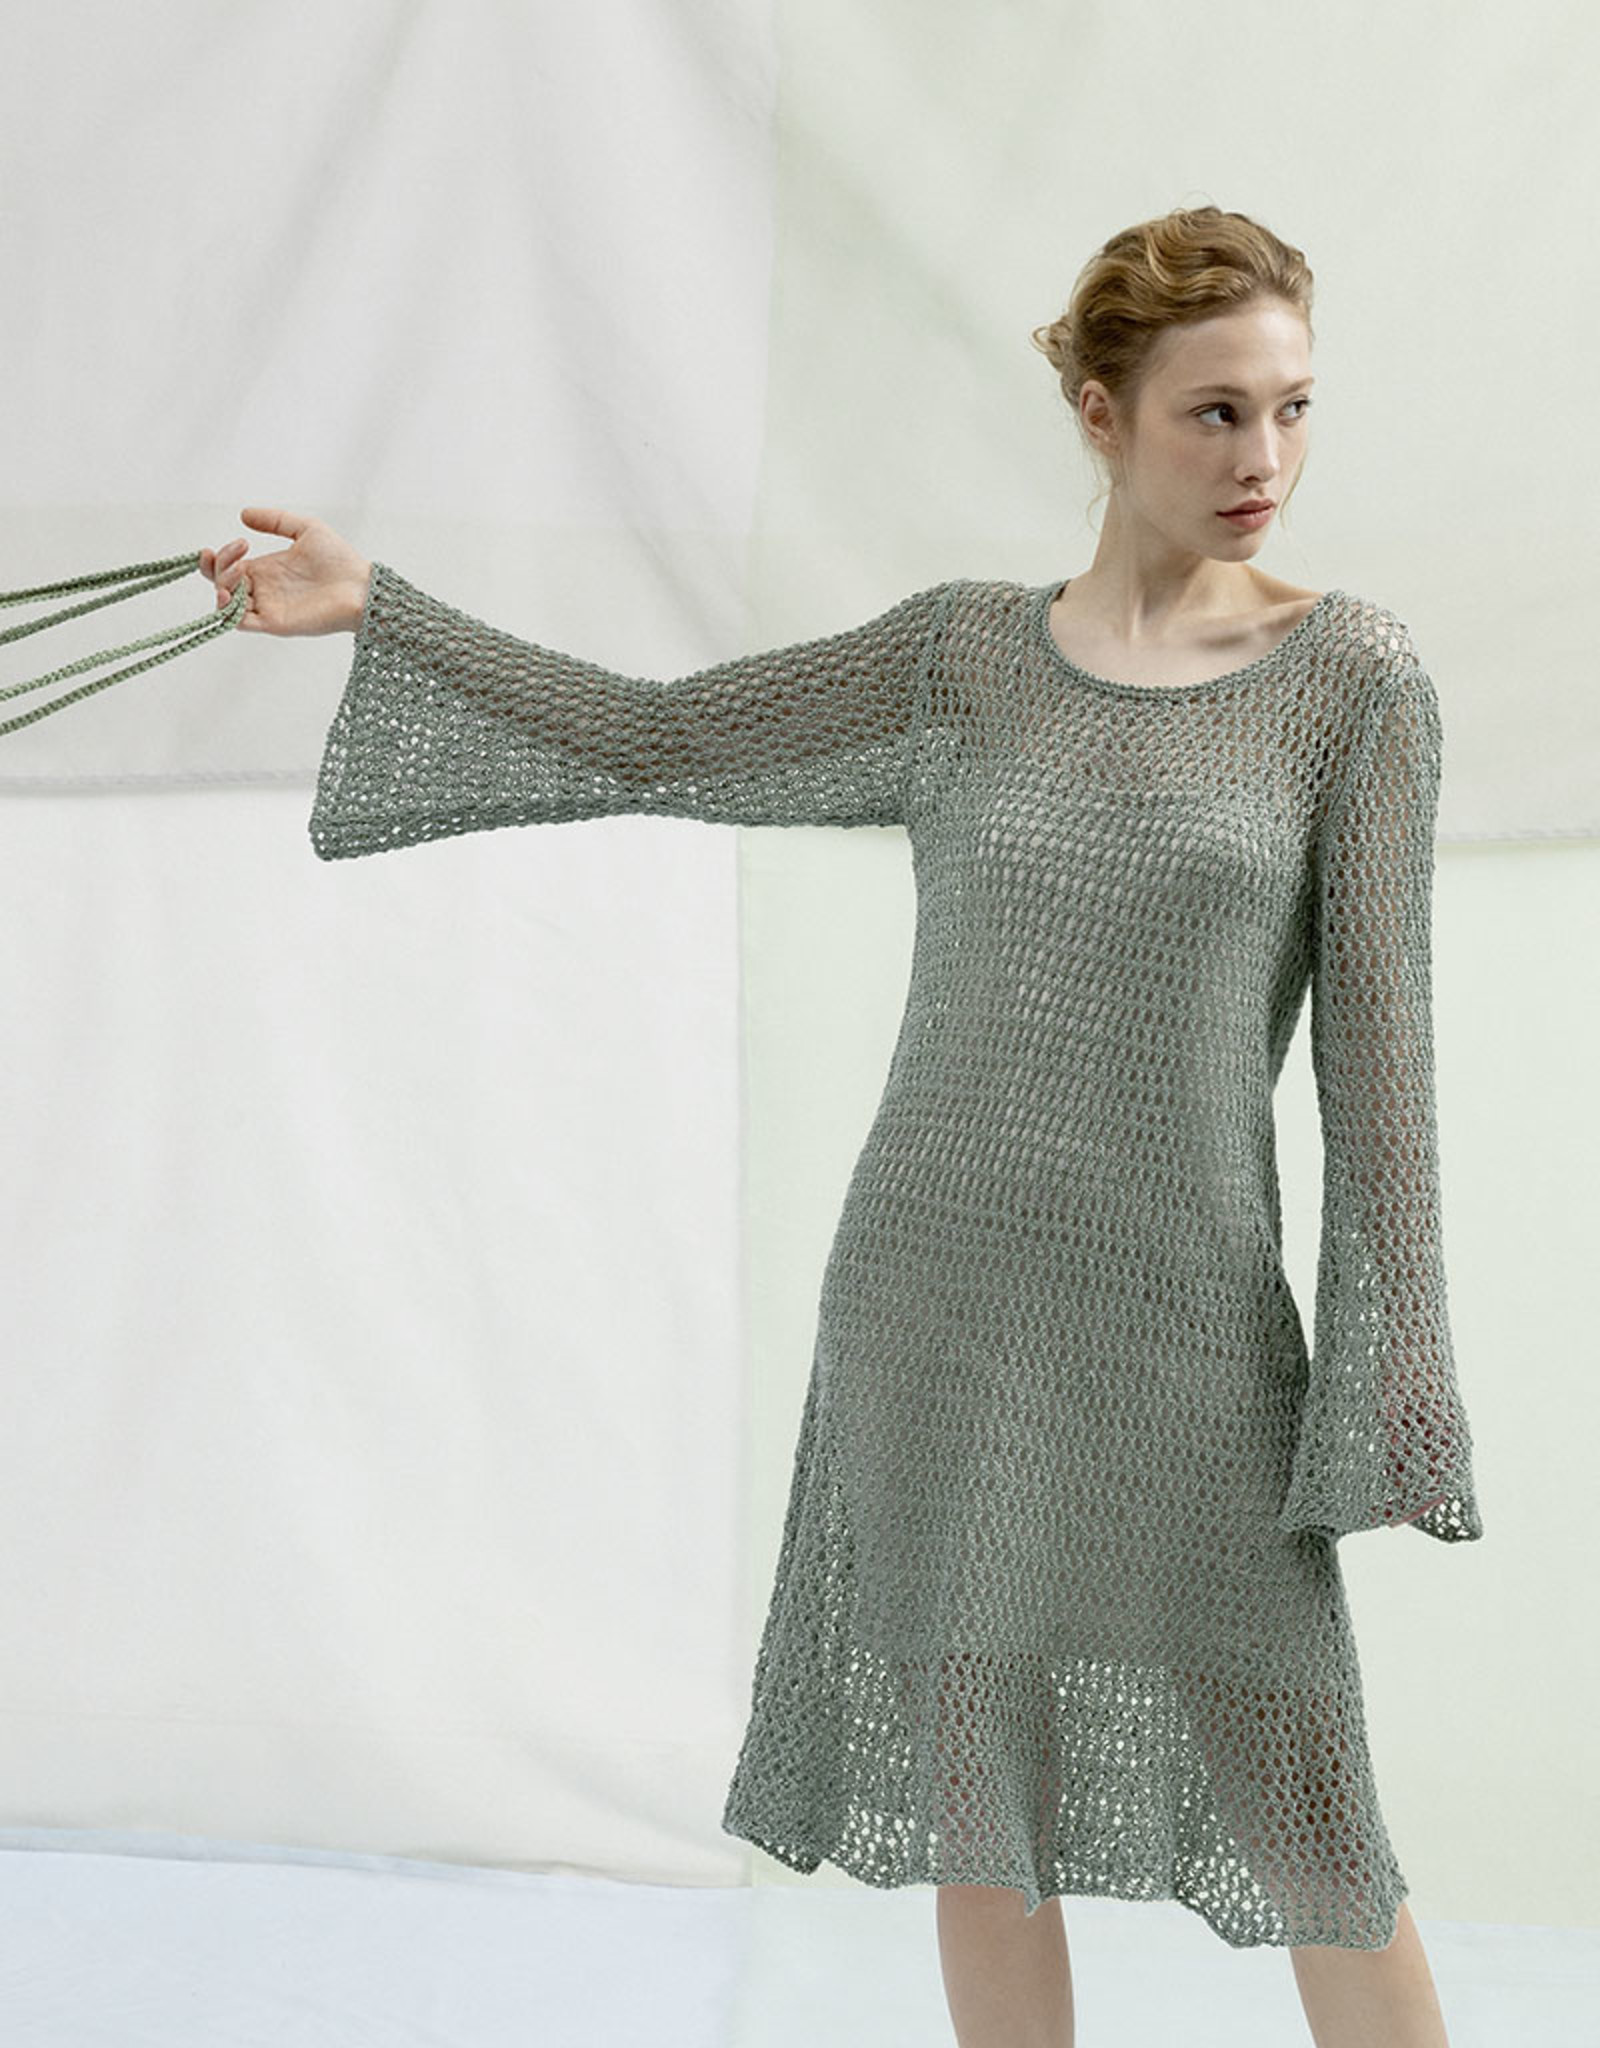 Angels-Knit by FDF Breipakket Jurk Canapa 071 - Smal